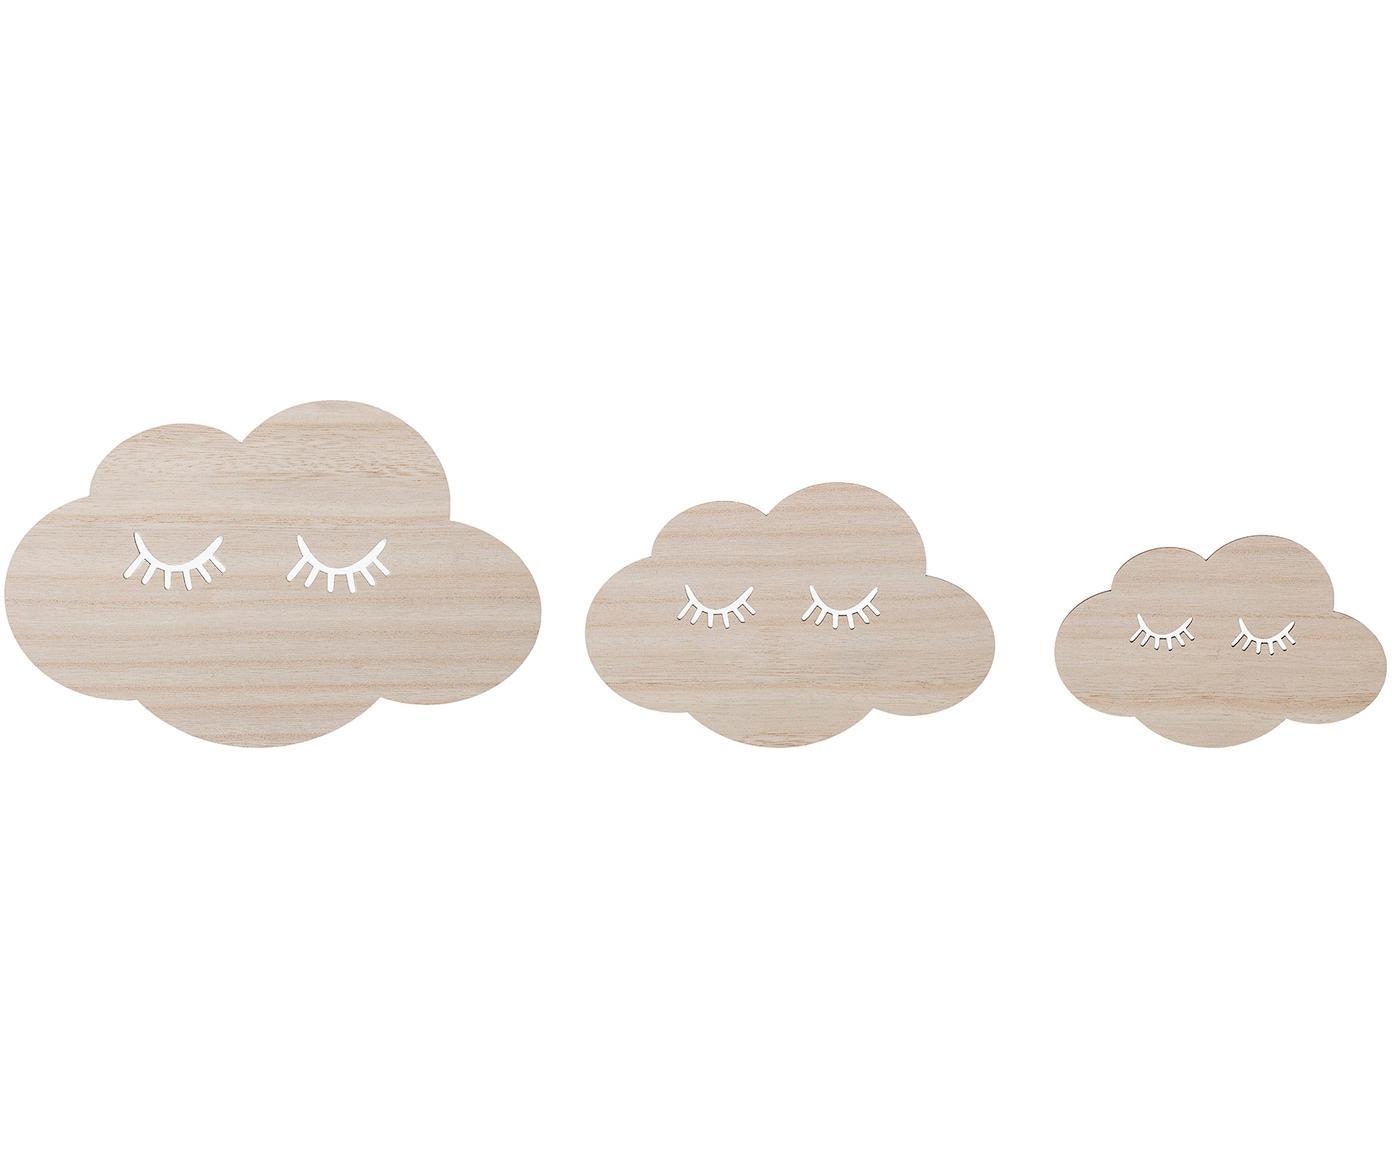 Wandobjekte-Set Clouds, 3-tlg., Holz, Braun, 21 x 14 cm